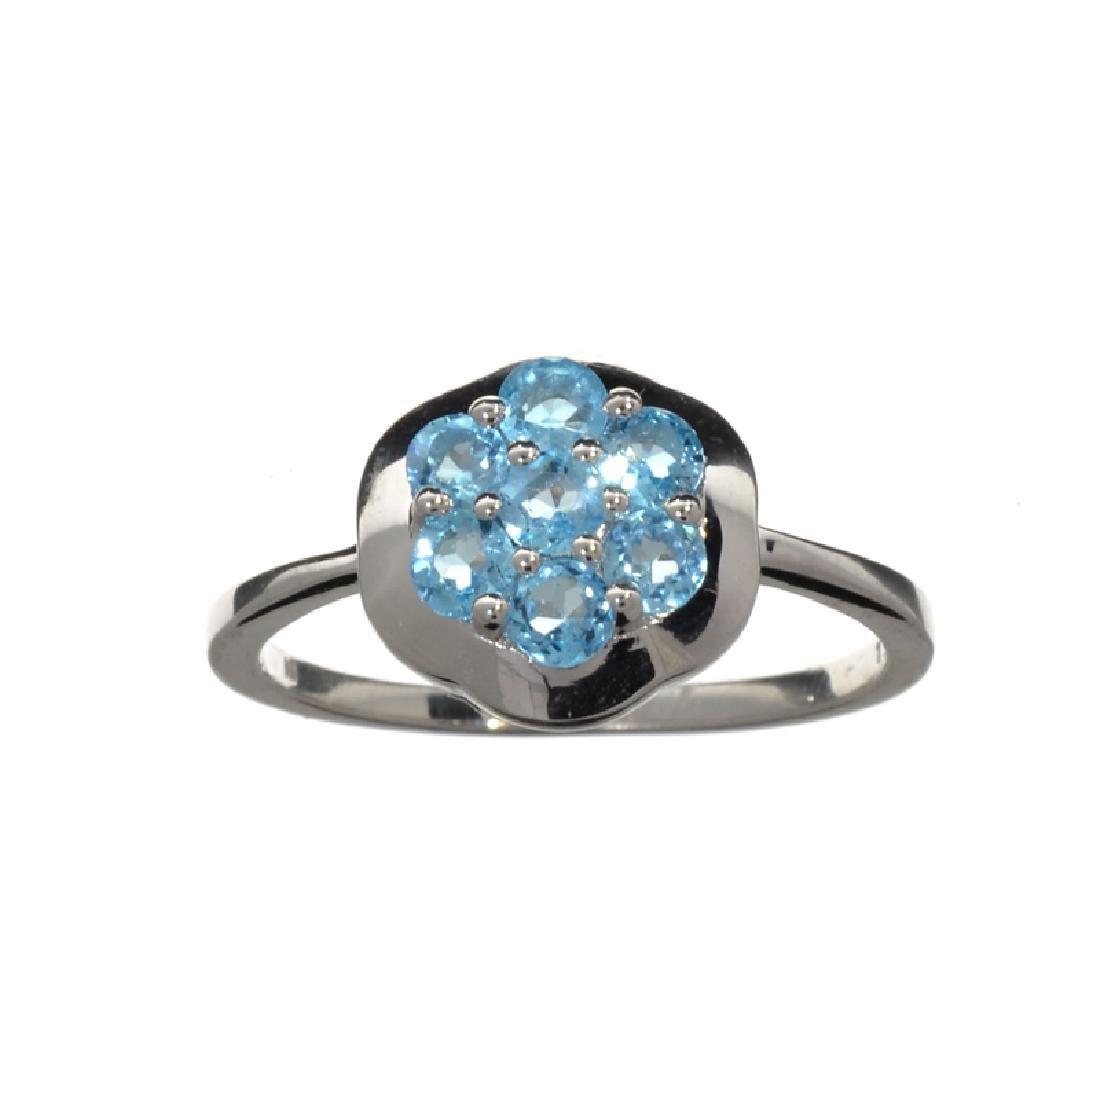 APP: 0.5k Fine Jewelry 0.30CT Round Cut Blue Topaz And